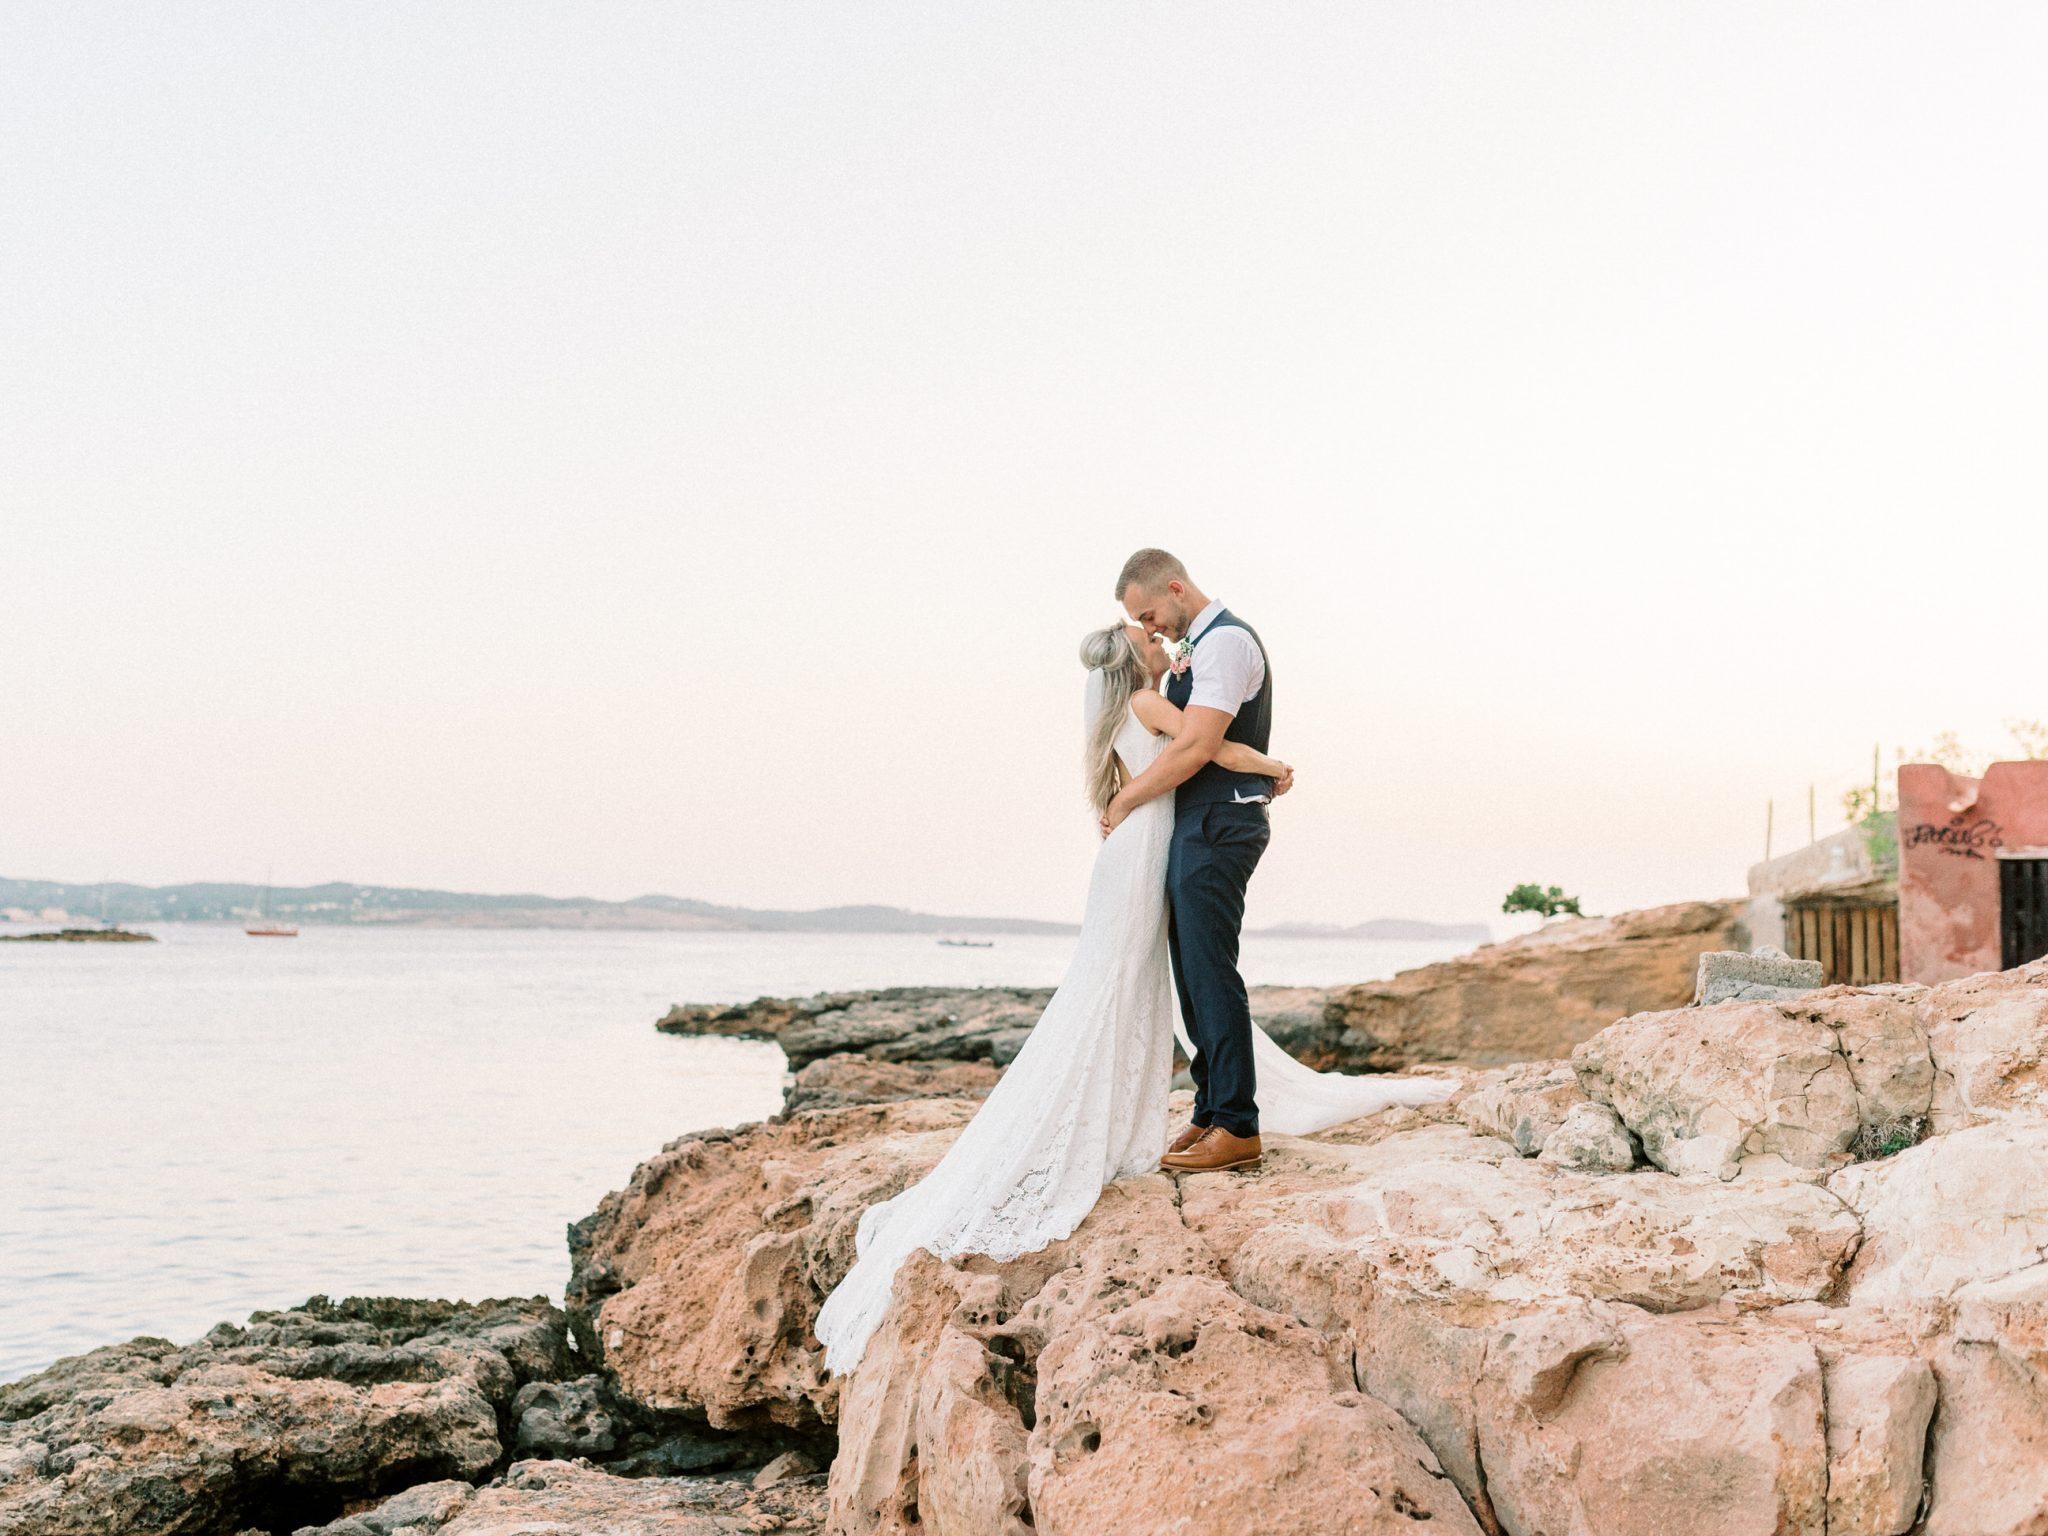 Best Wedding Photographer Ibiza - Wedding Venue Cala Gracioneta